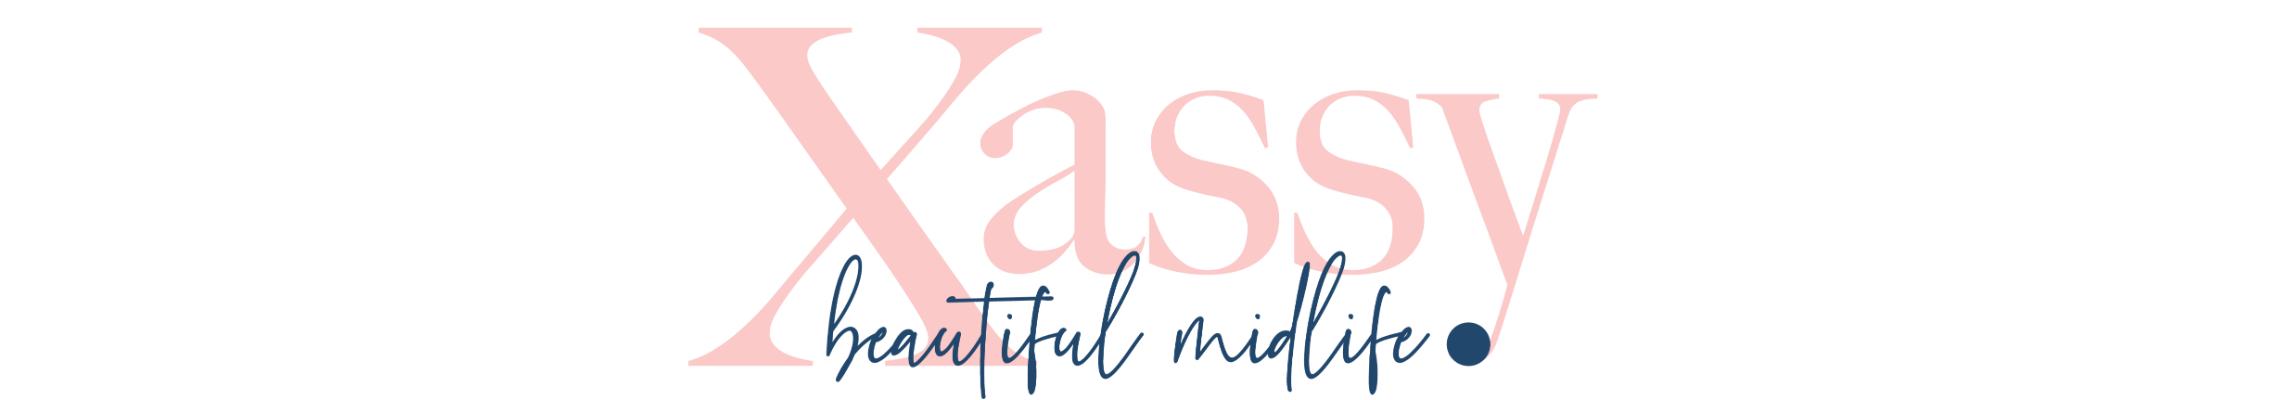 Xassy